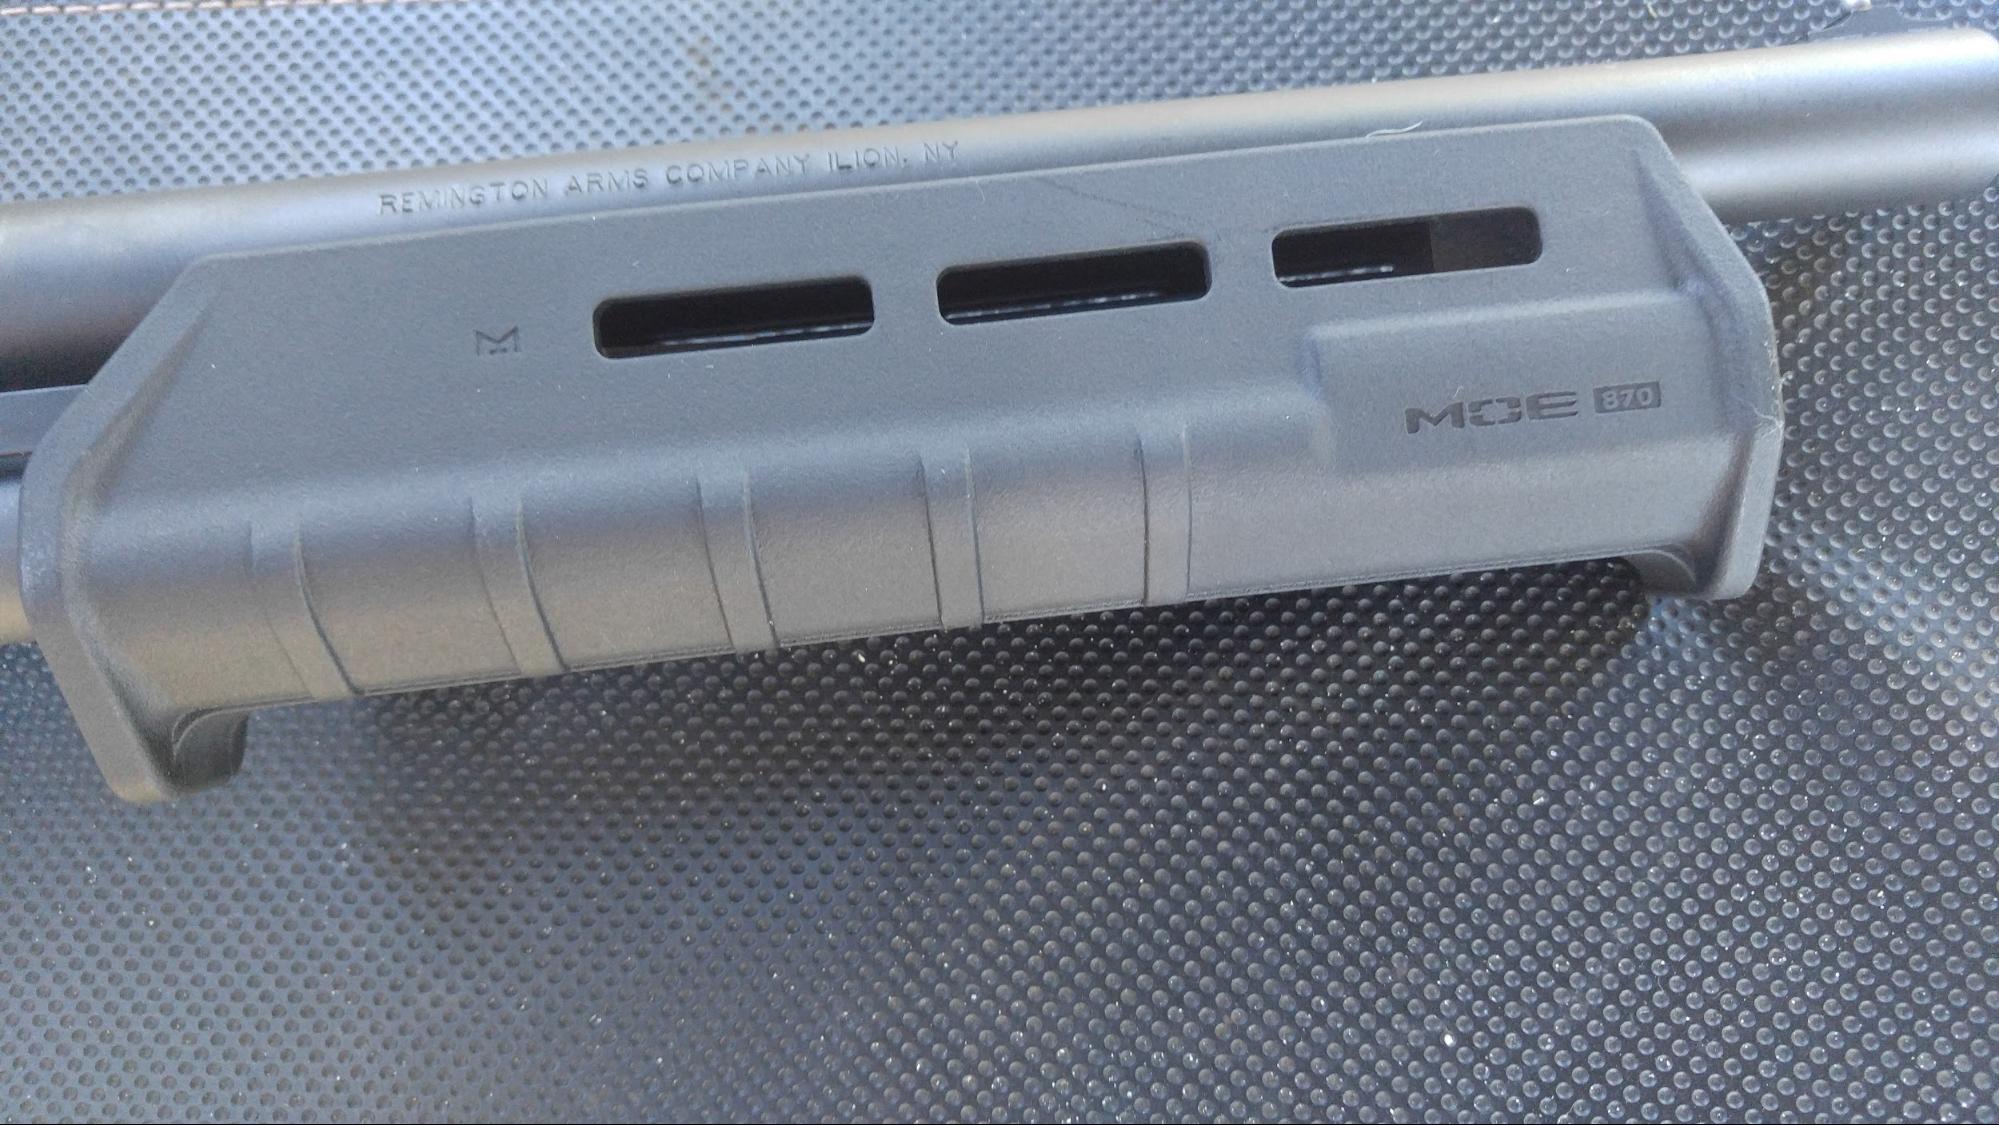 Magpul shotgun slide on Tac-14